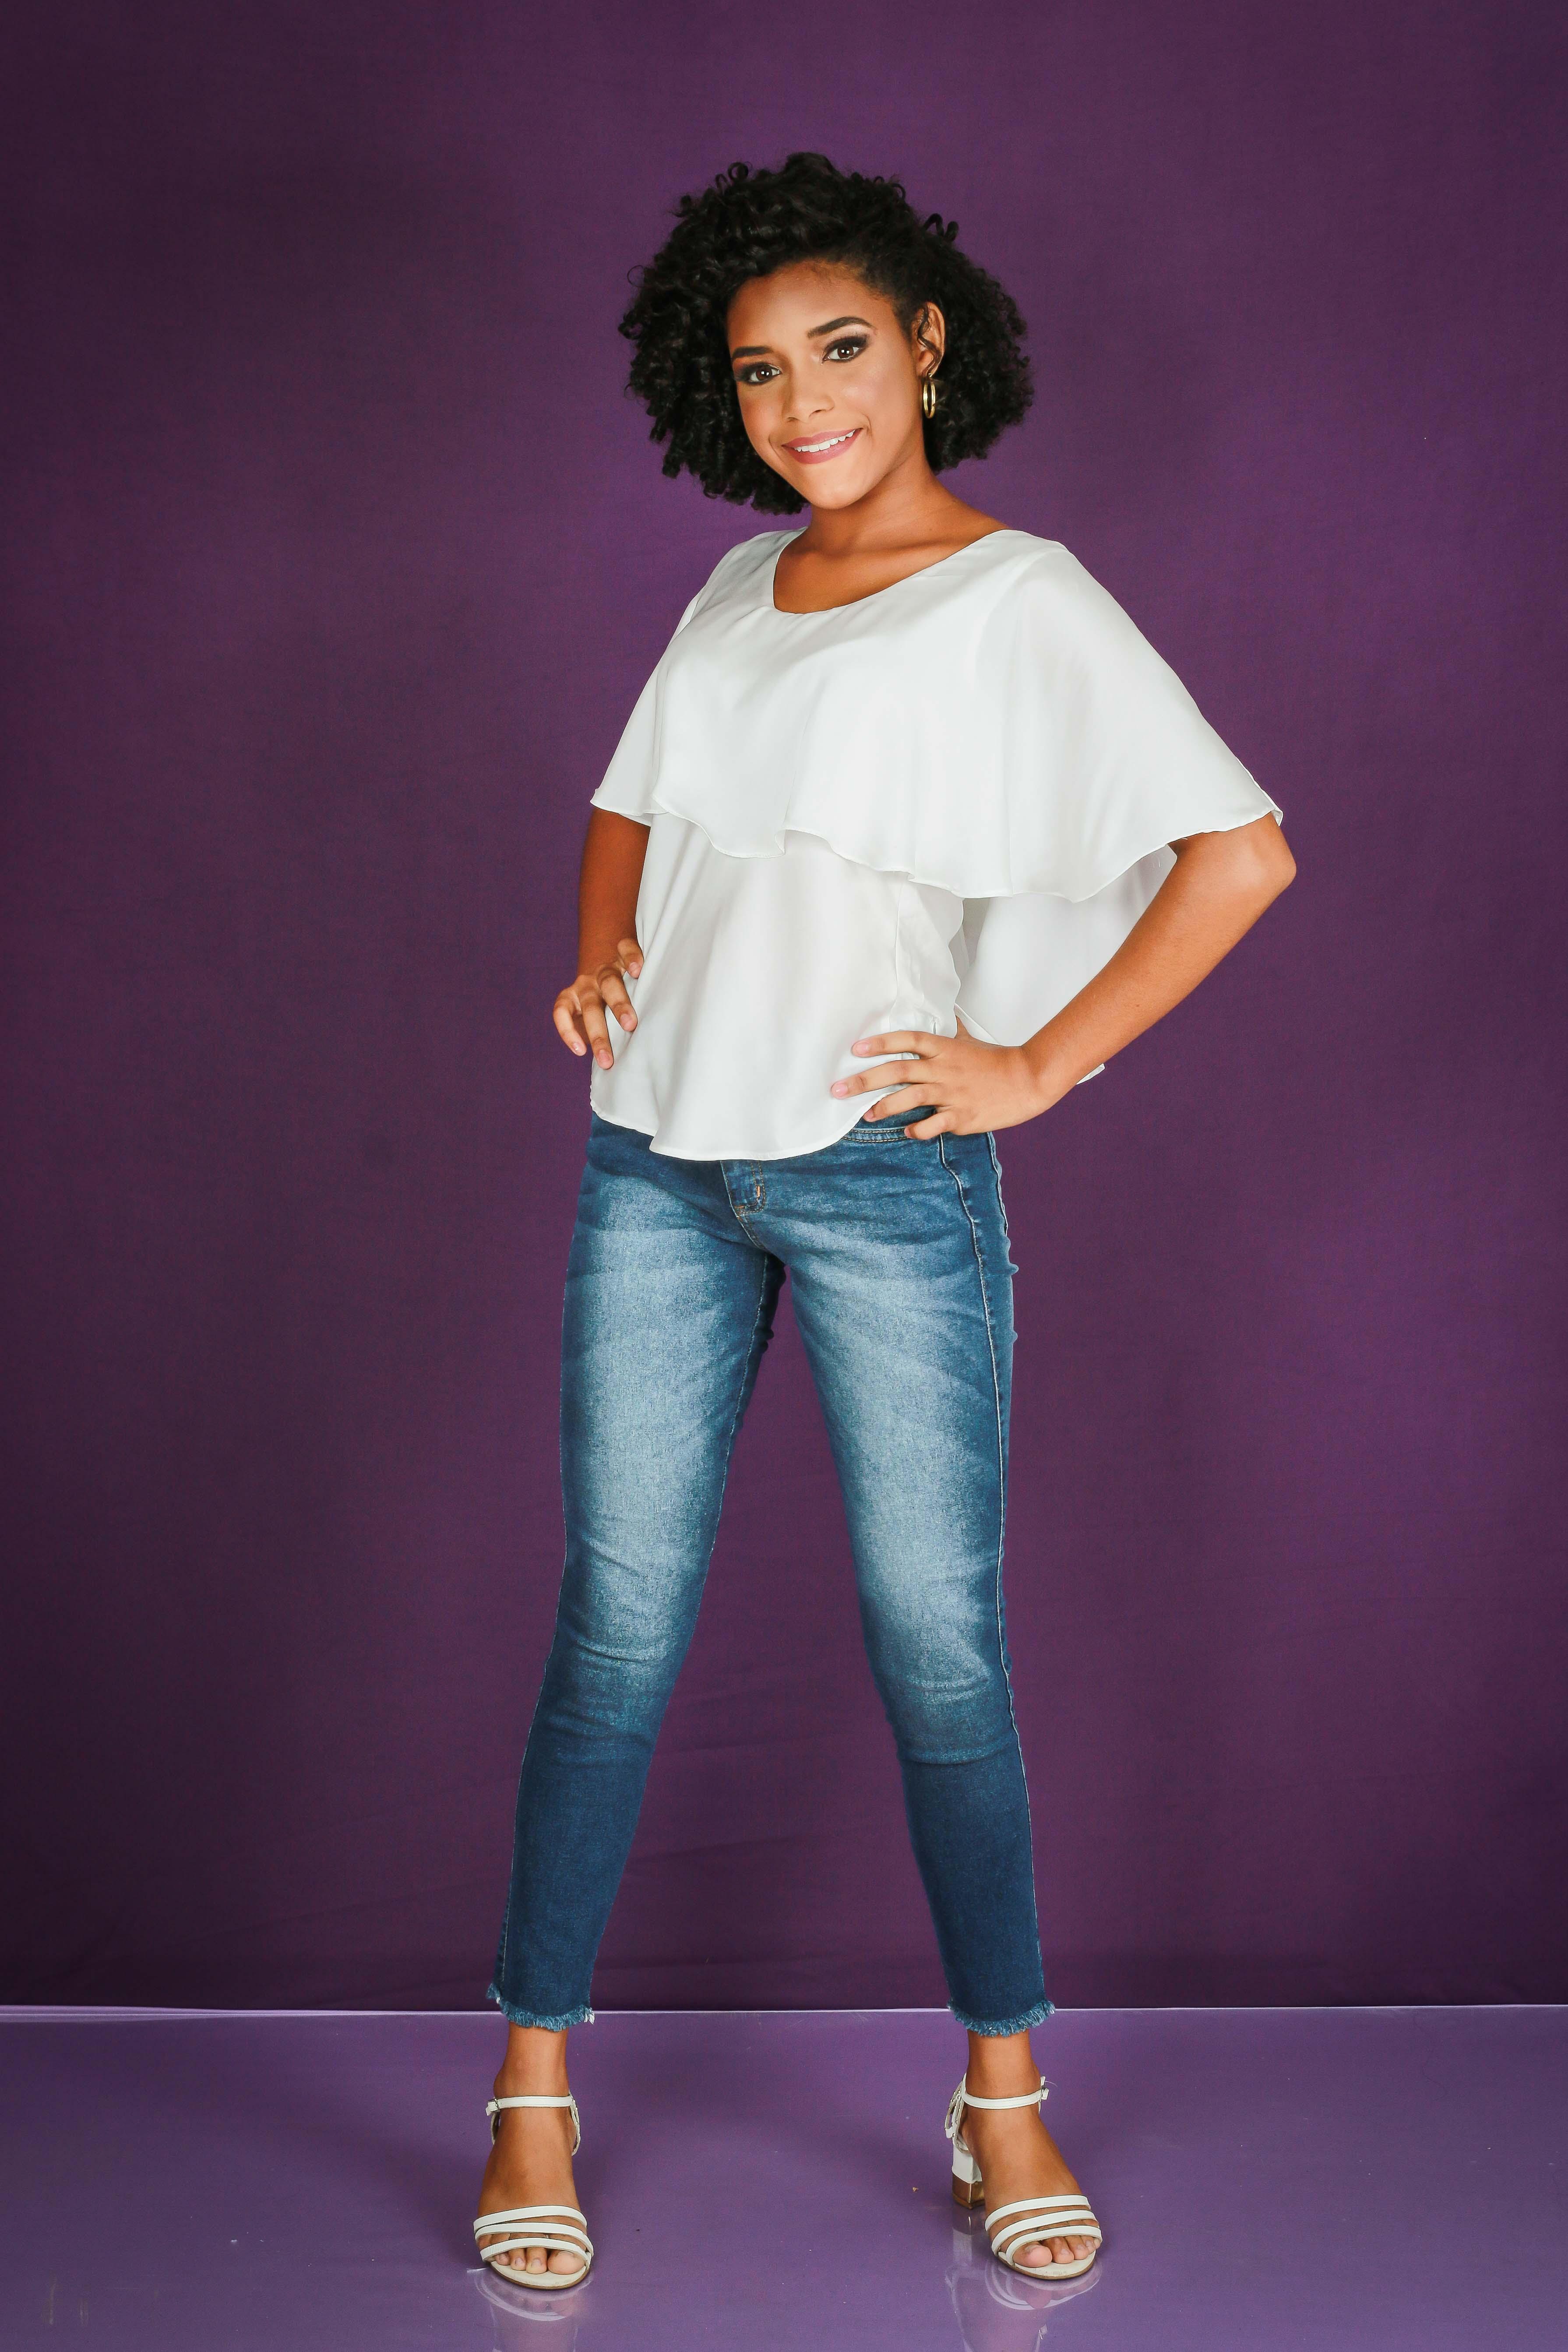 Jennifer-Adriana Azevedo-16